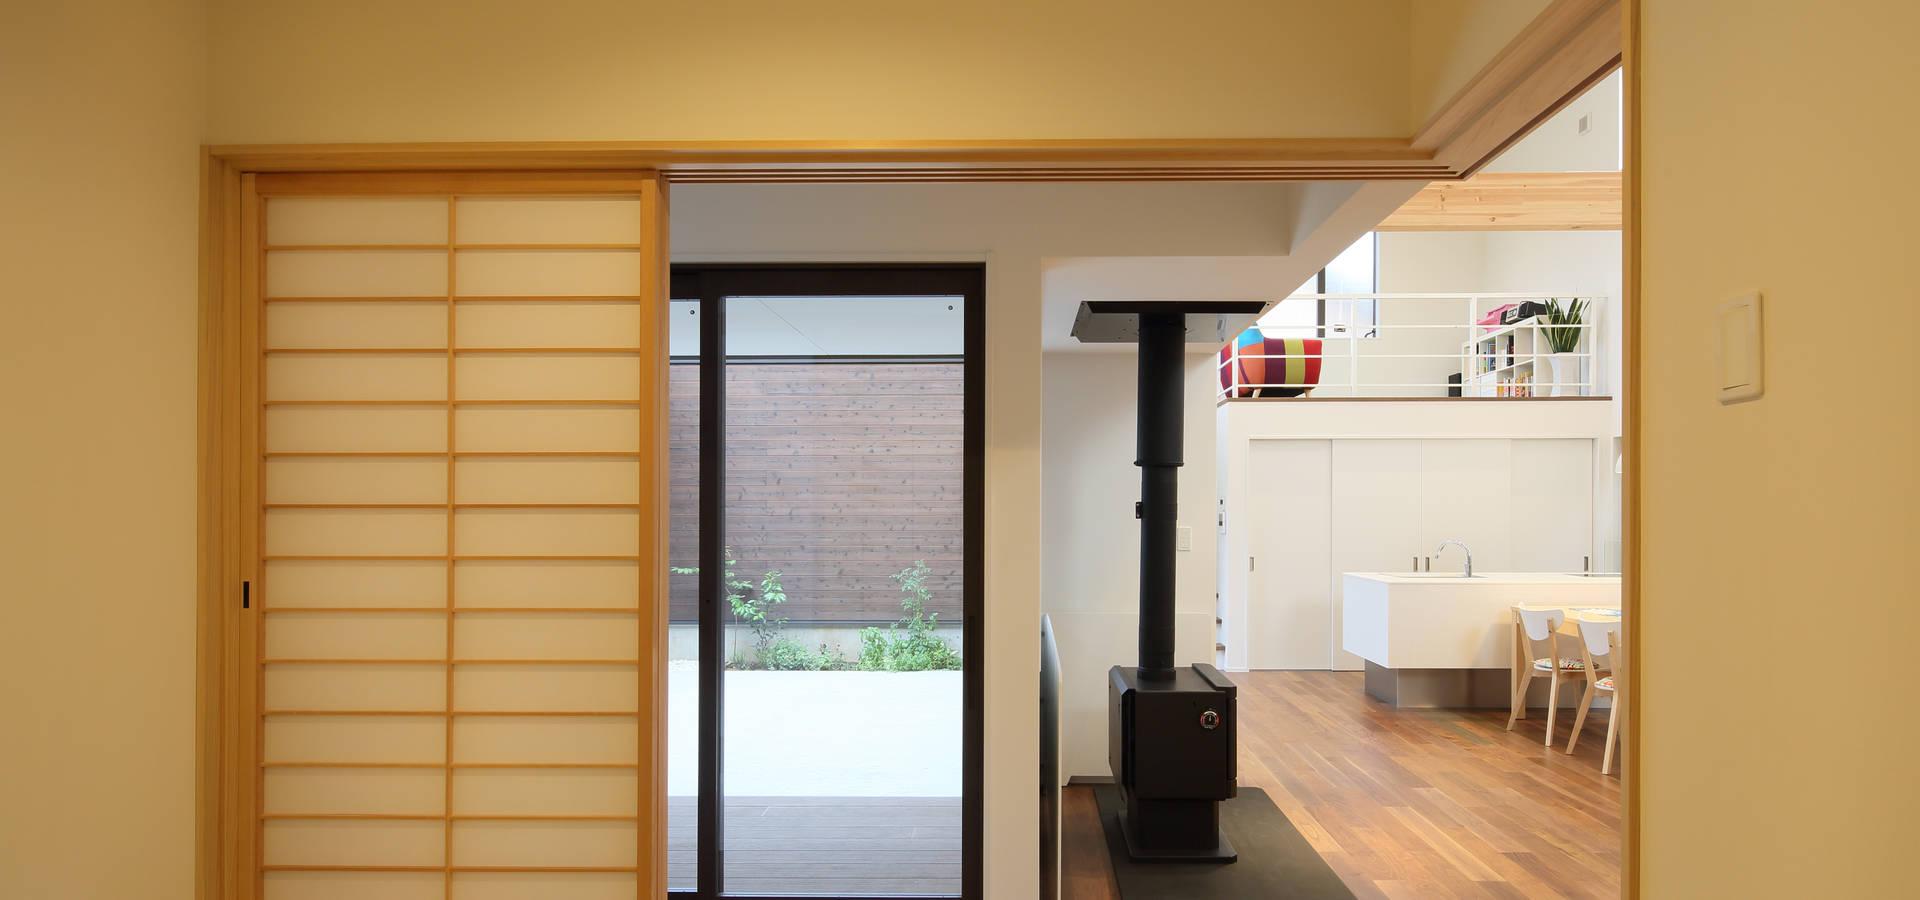 arakawa Architects & Associates